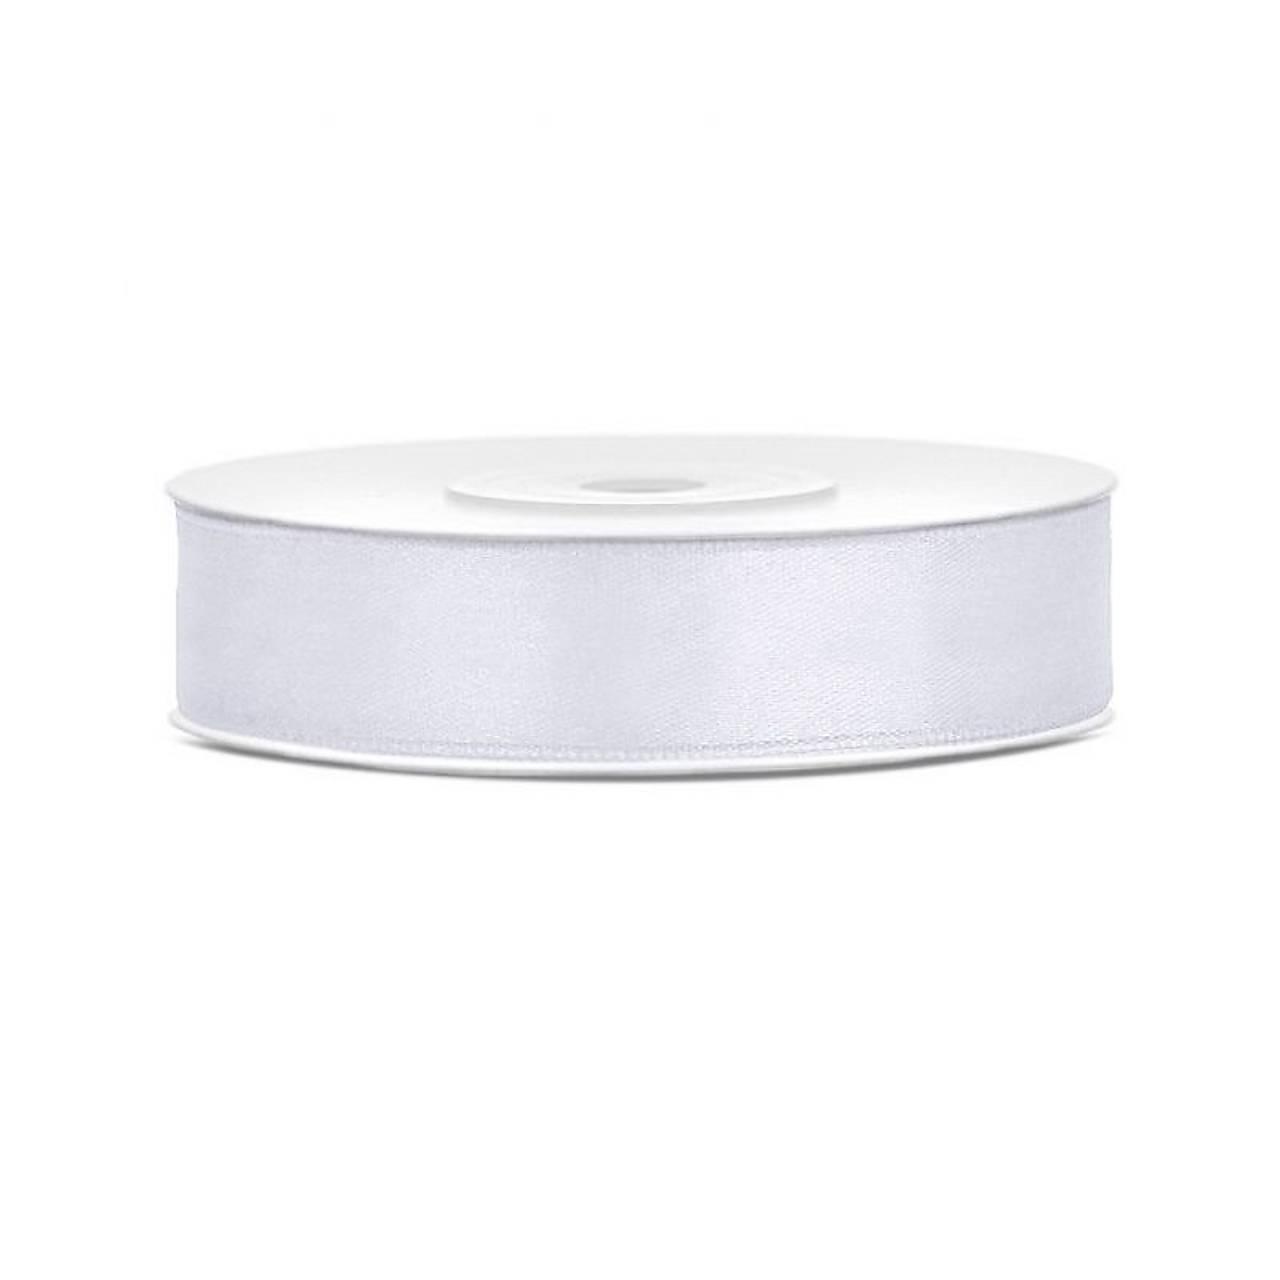 saténová stuha 12mm biela - Obrázok č. 1